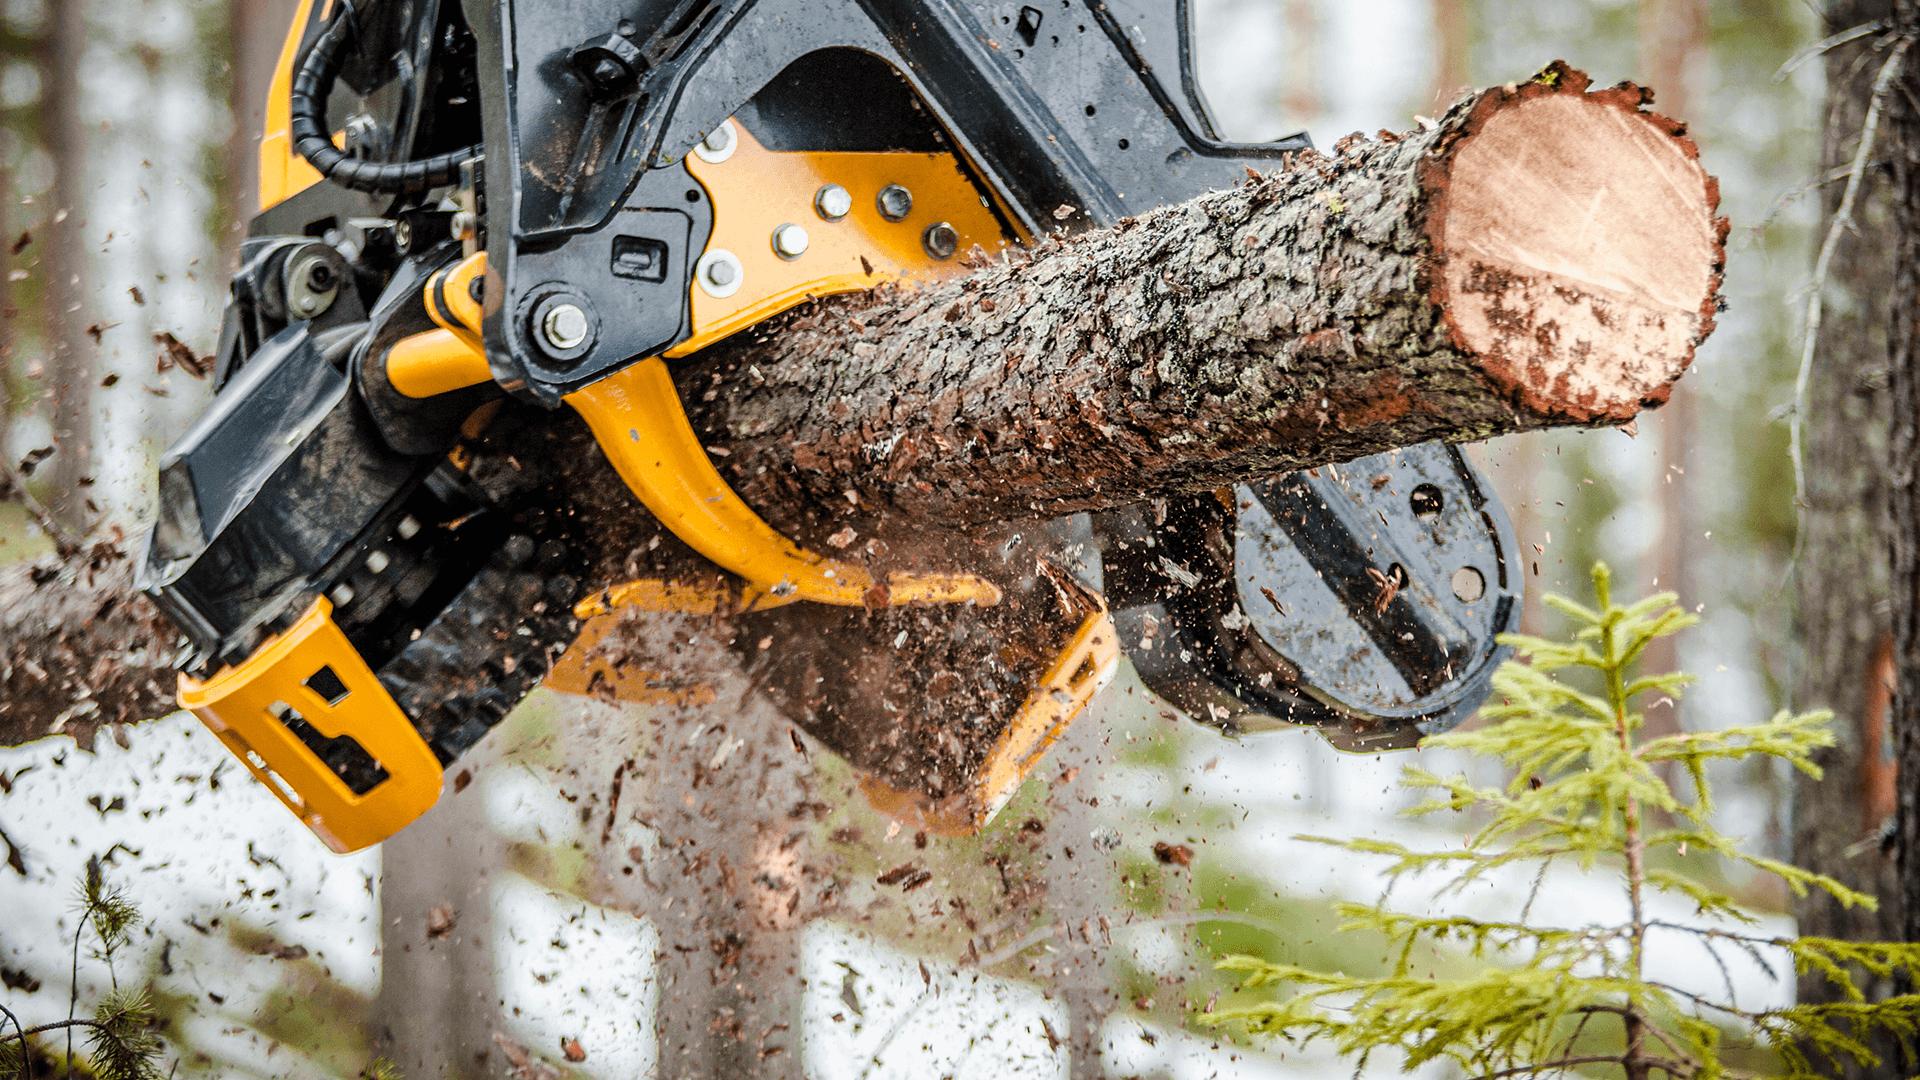 Forstmaschinenversicherung